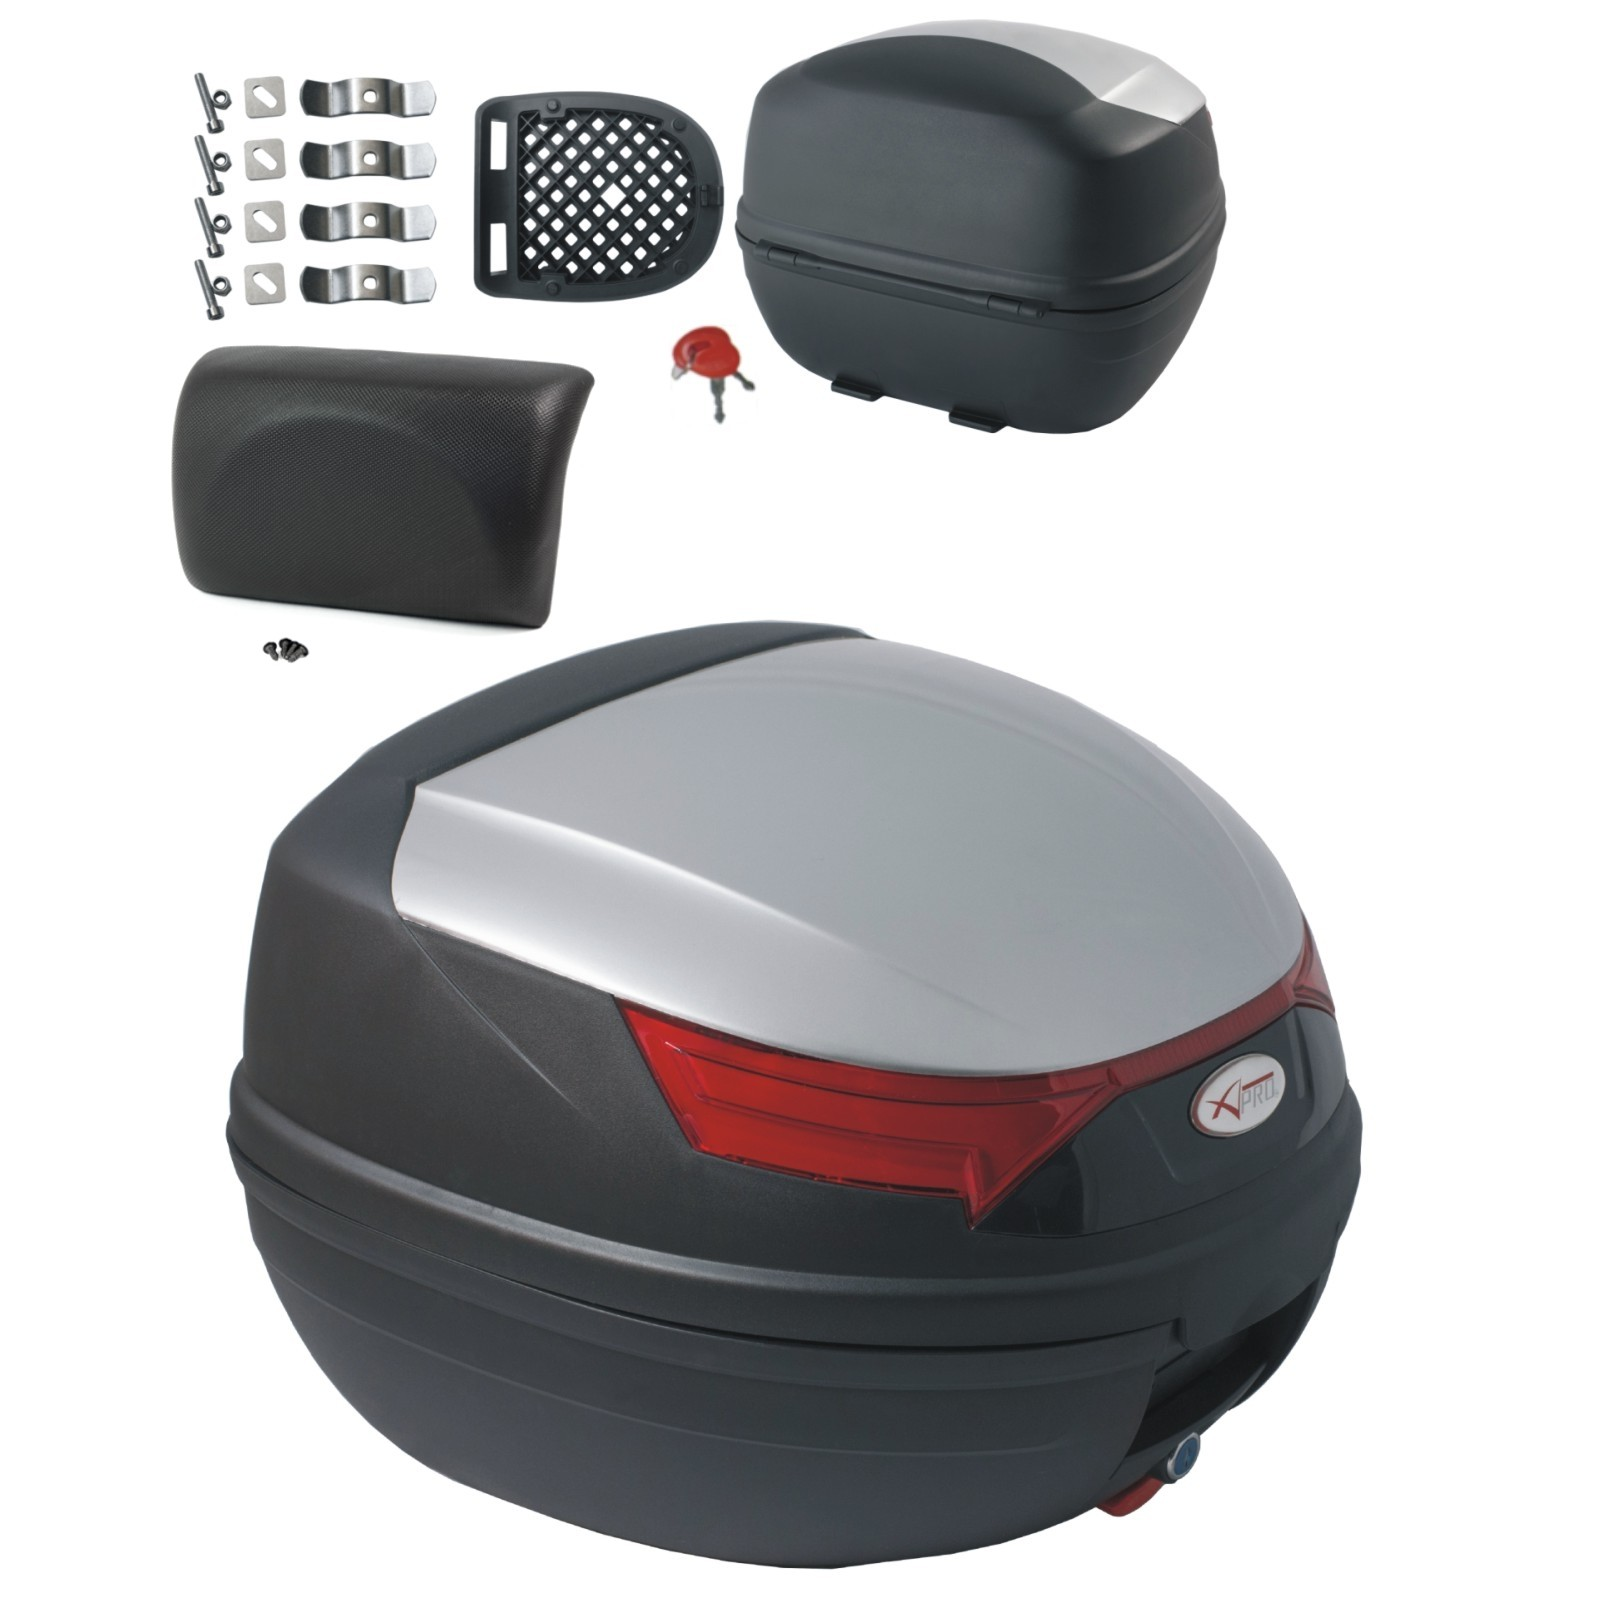 A-pro Universal Polypropylene Motorcycle Motorbike Scooter Luggage Box Top Case White